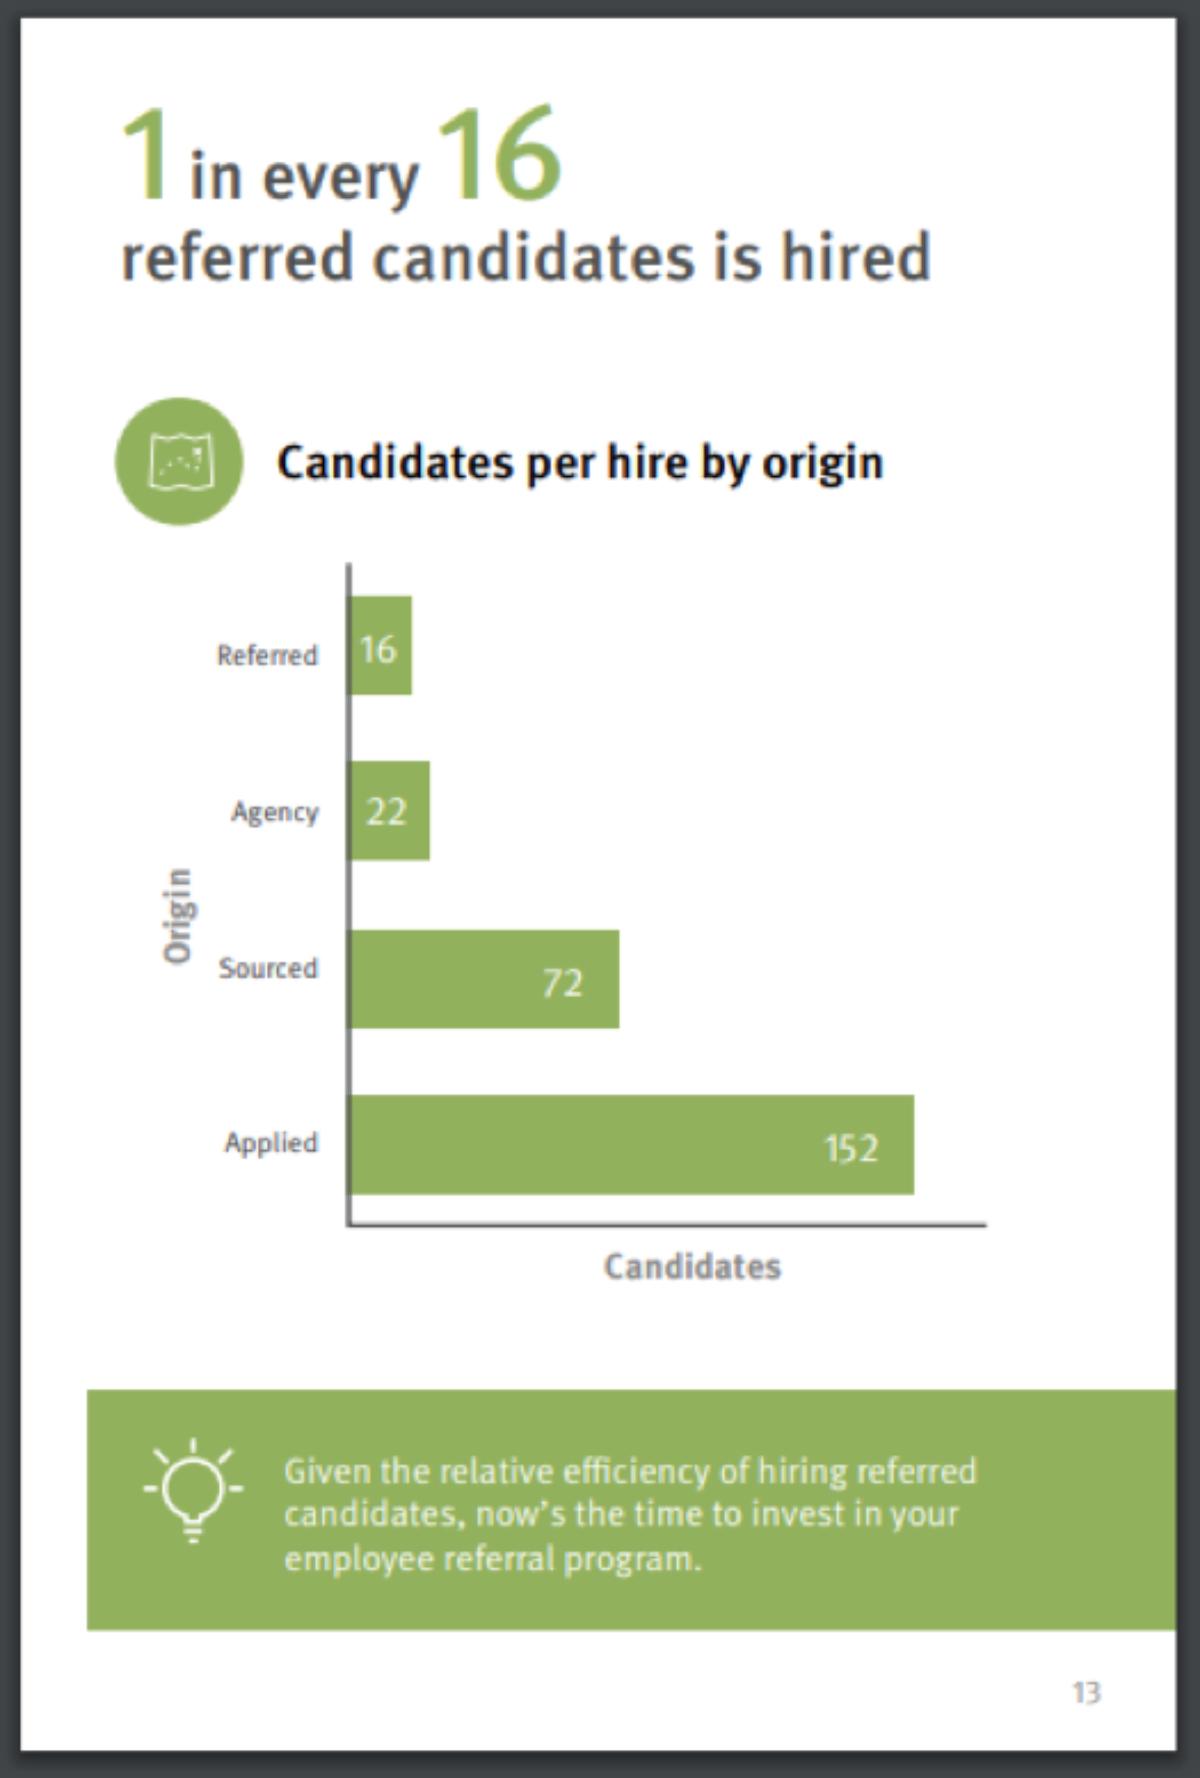 job candidate hiring